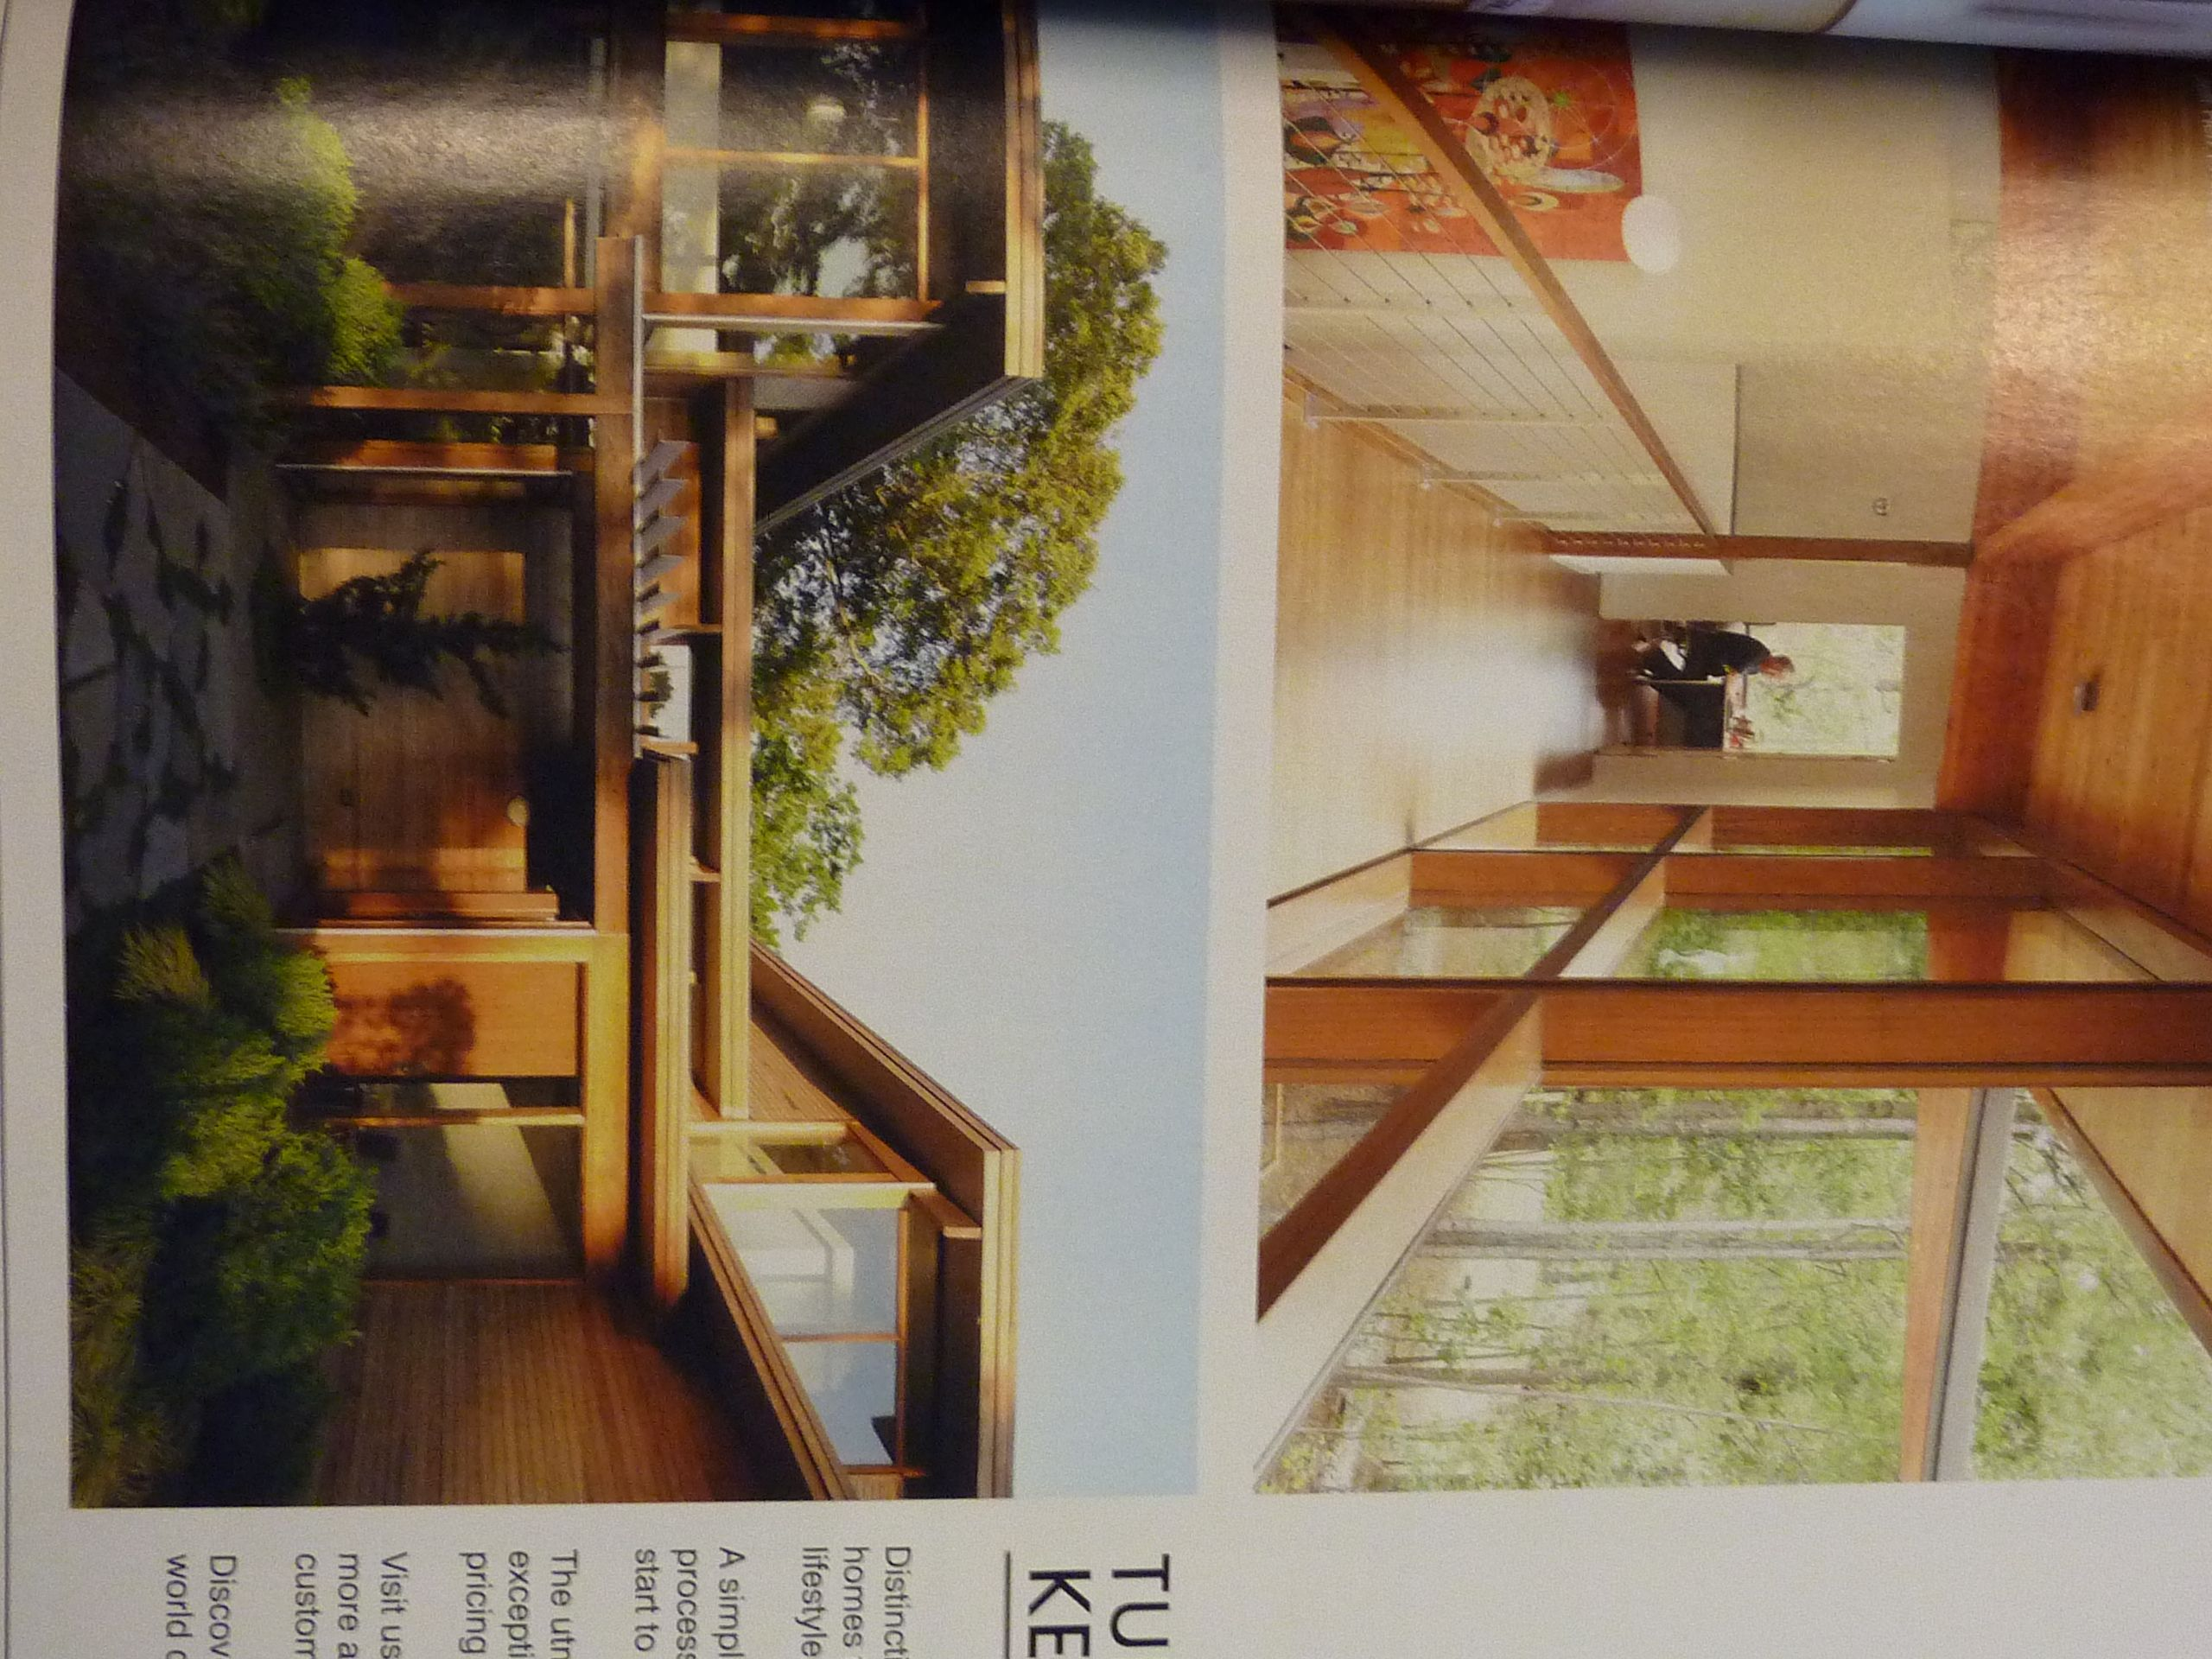 dwell mag | BCC Home design | Pinterest